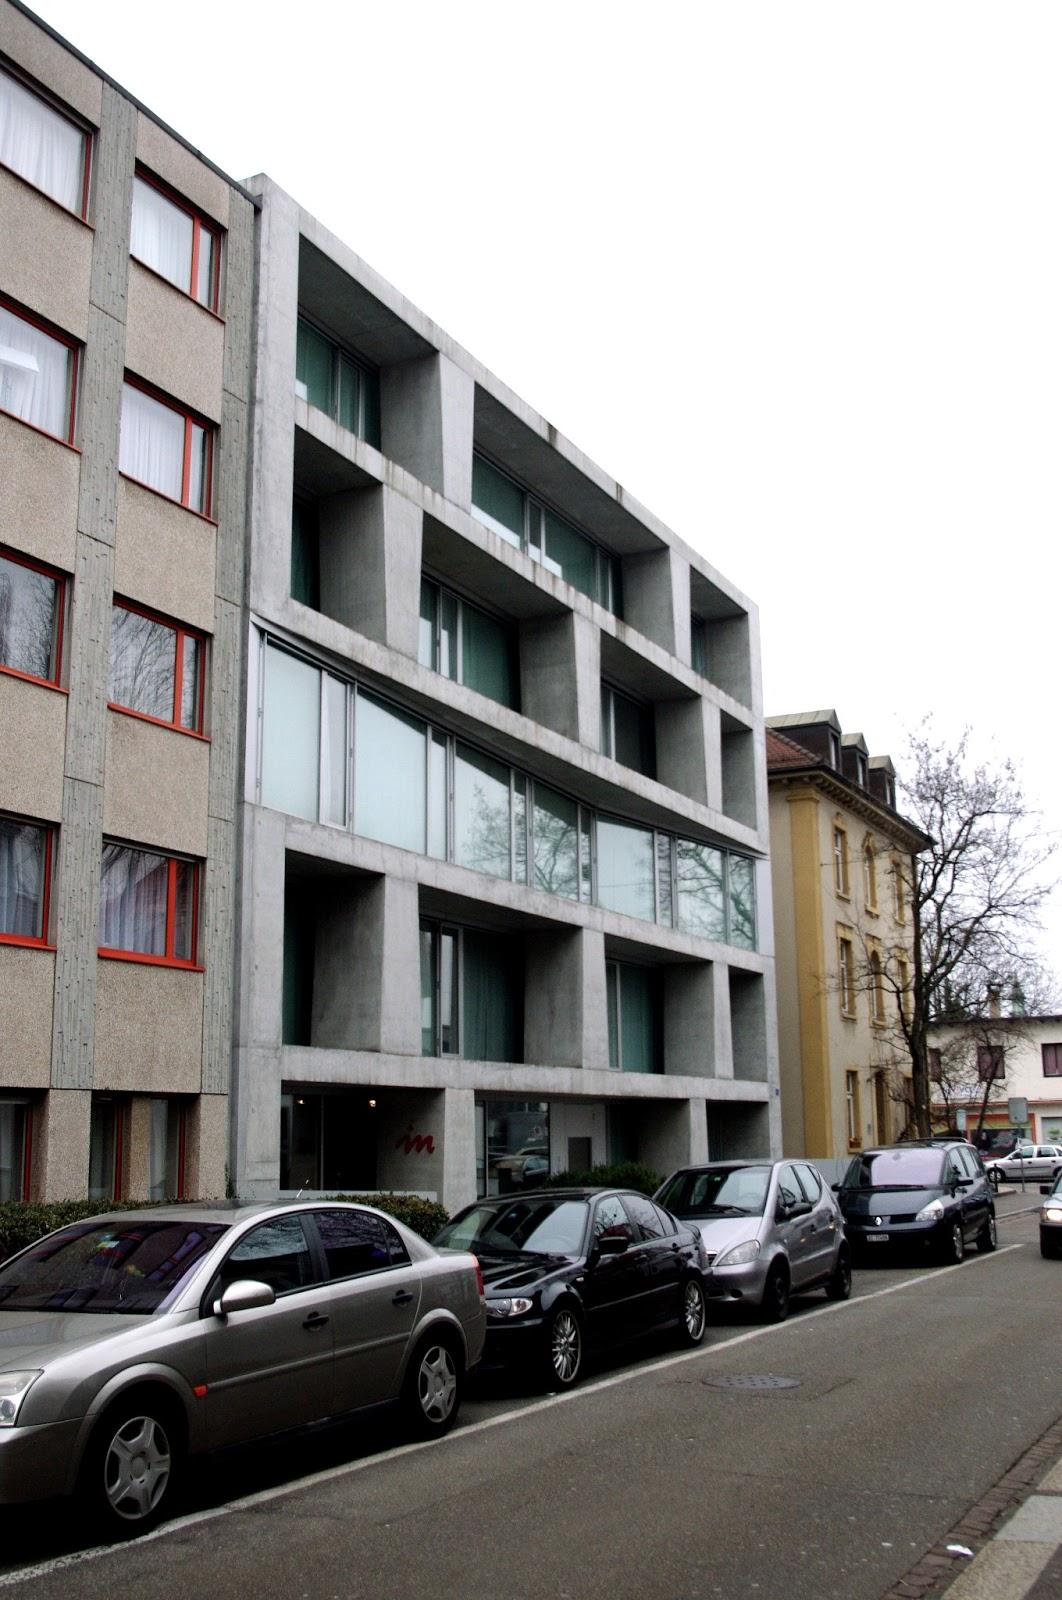 M2c blog residential building by silvia gm r reto gm r - Architekten basel ...